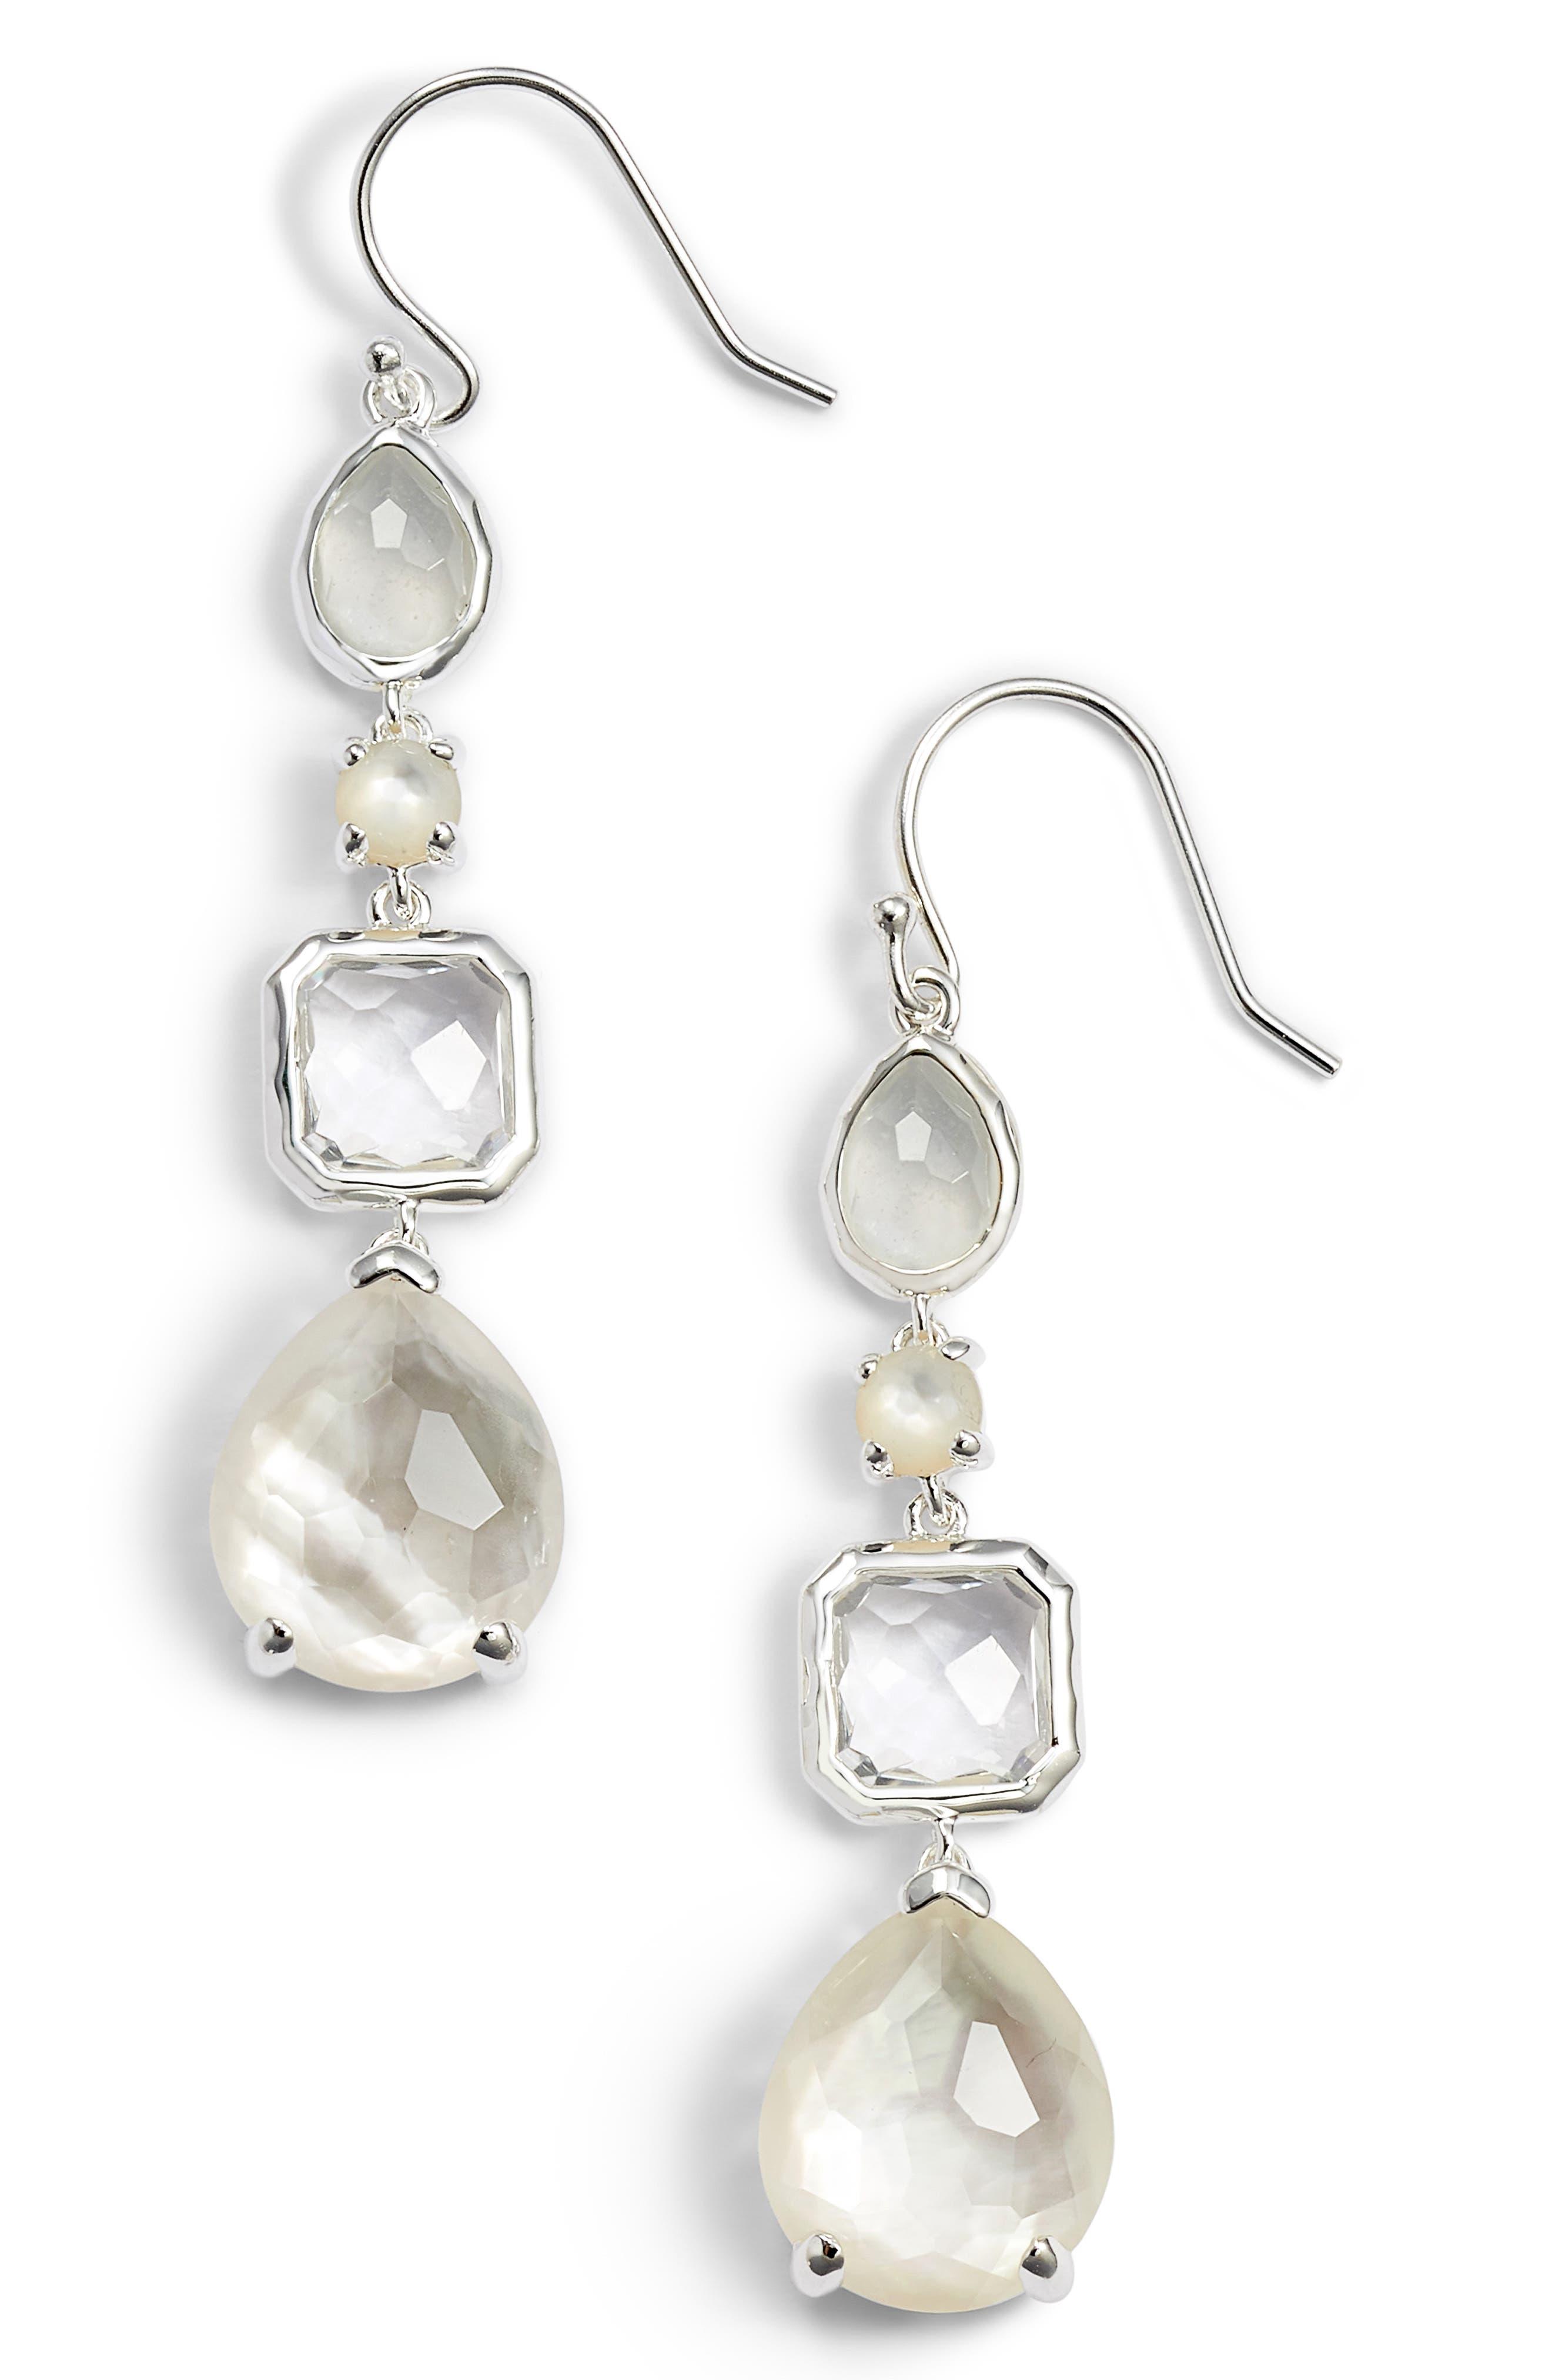 'Rock Candy' Semiprecious Stone Linear Drop Earrings,                             Main thumbnail 1, color,                             Silver/ Flirt